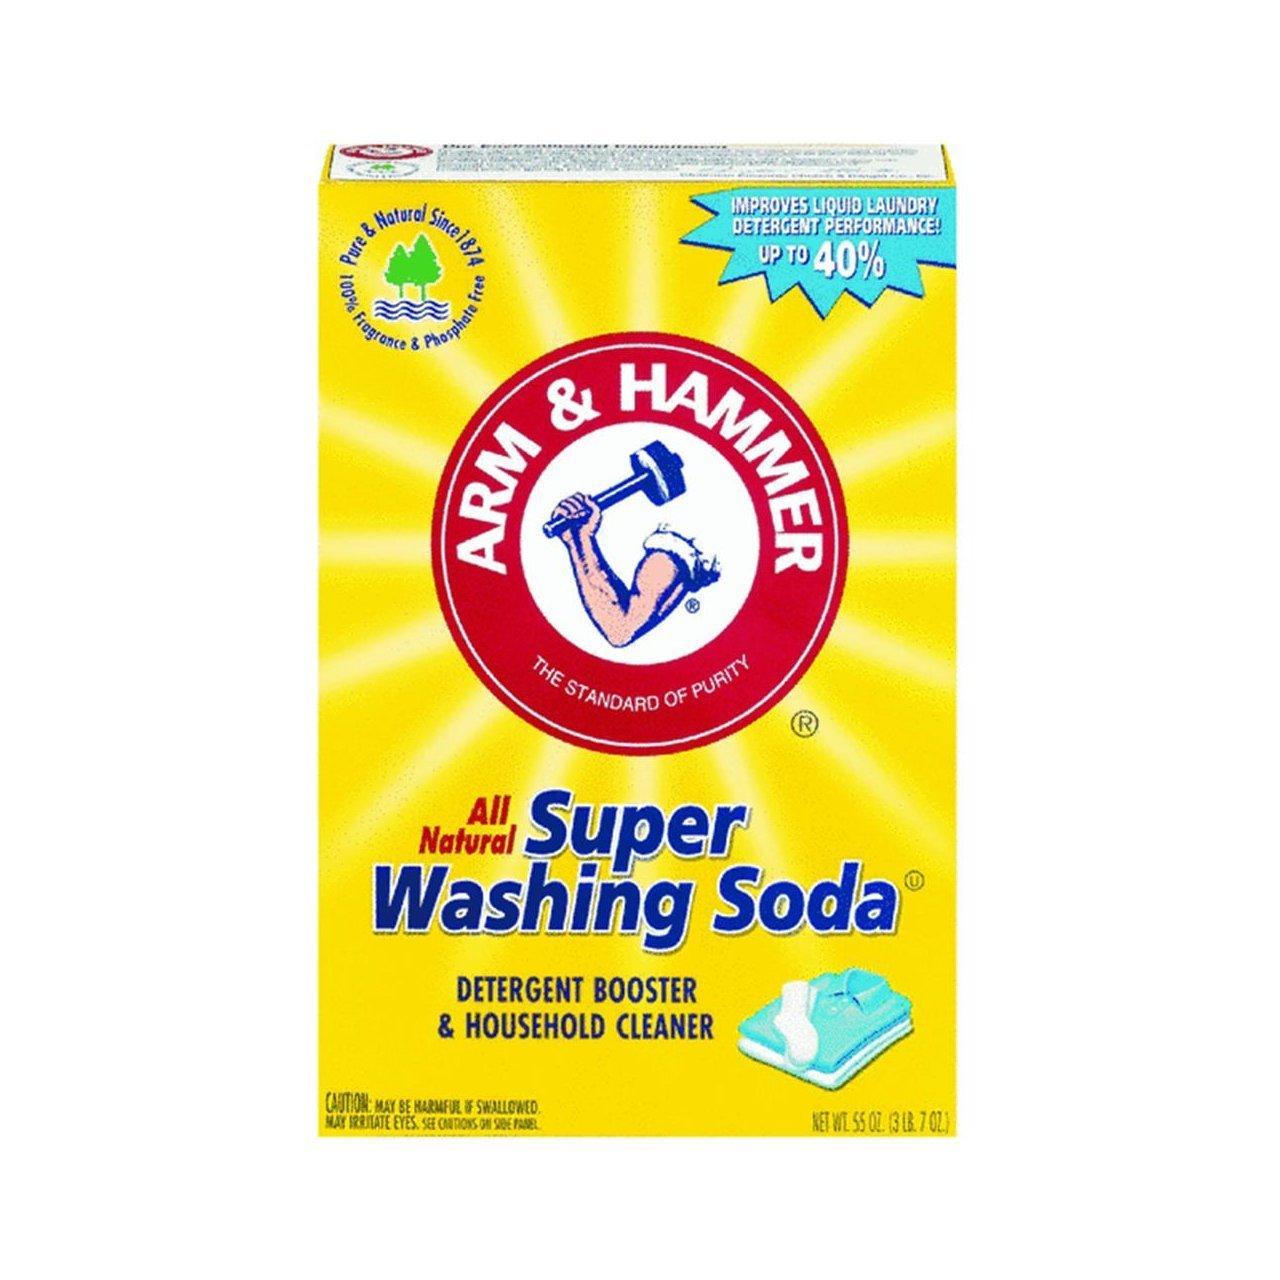 Church & Dwight Co 03020 Arm & Hammer Super Washing Soda 55 oz.-Super Pack-Pack of 4